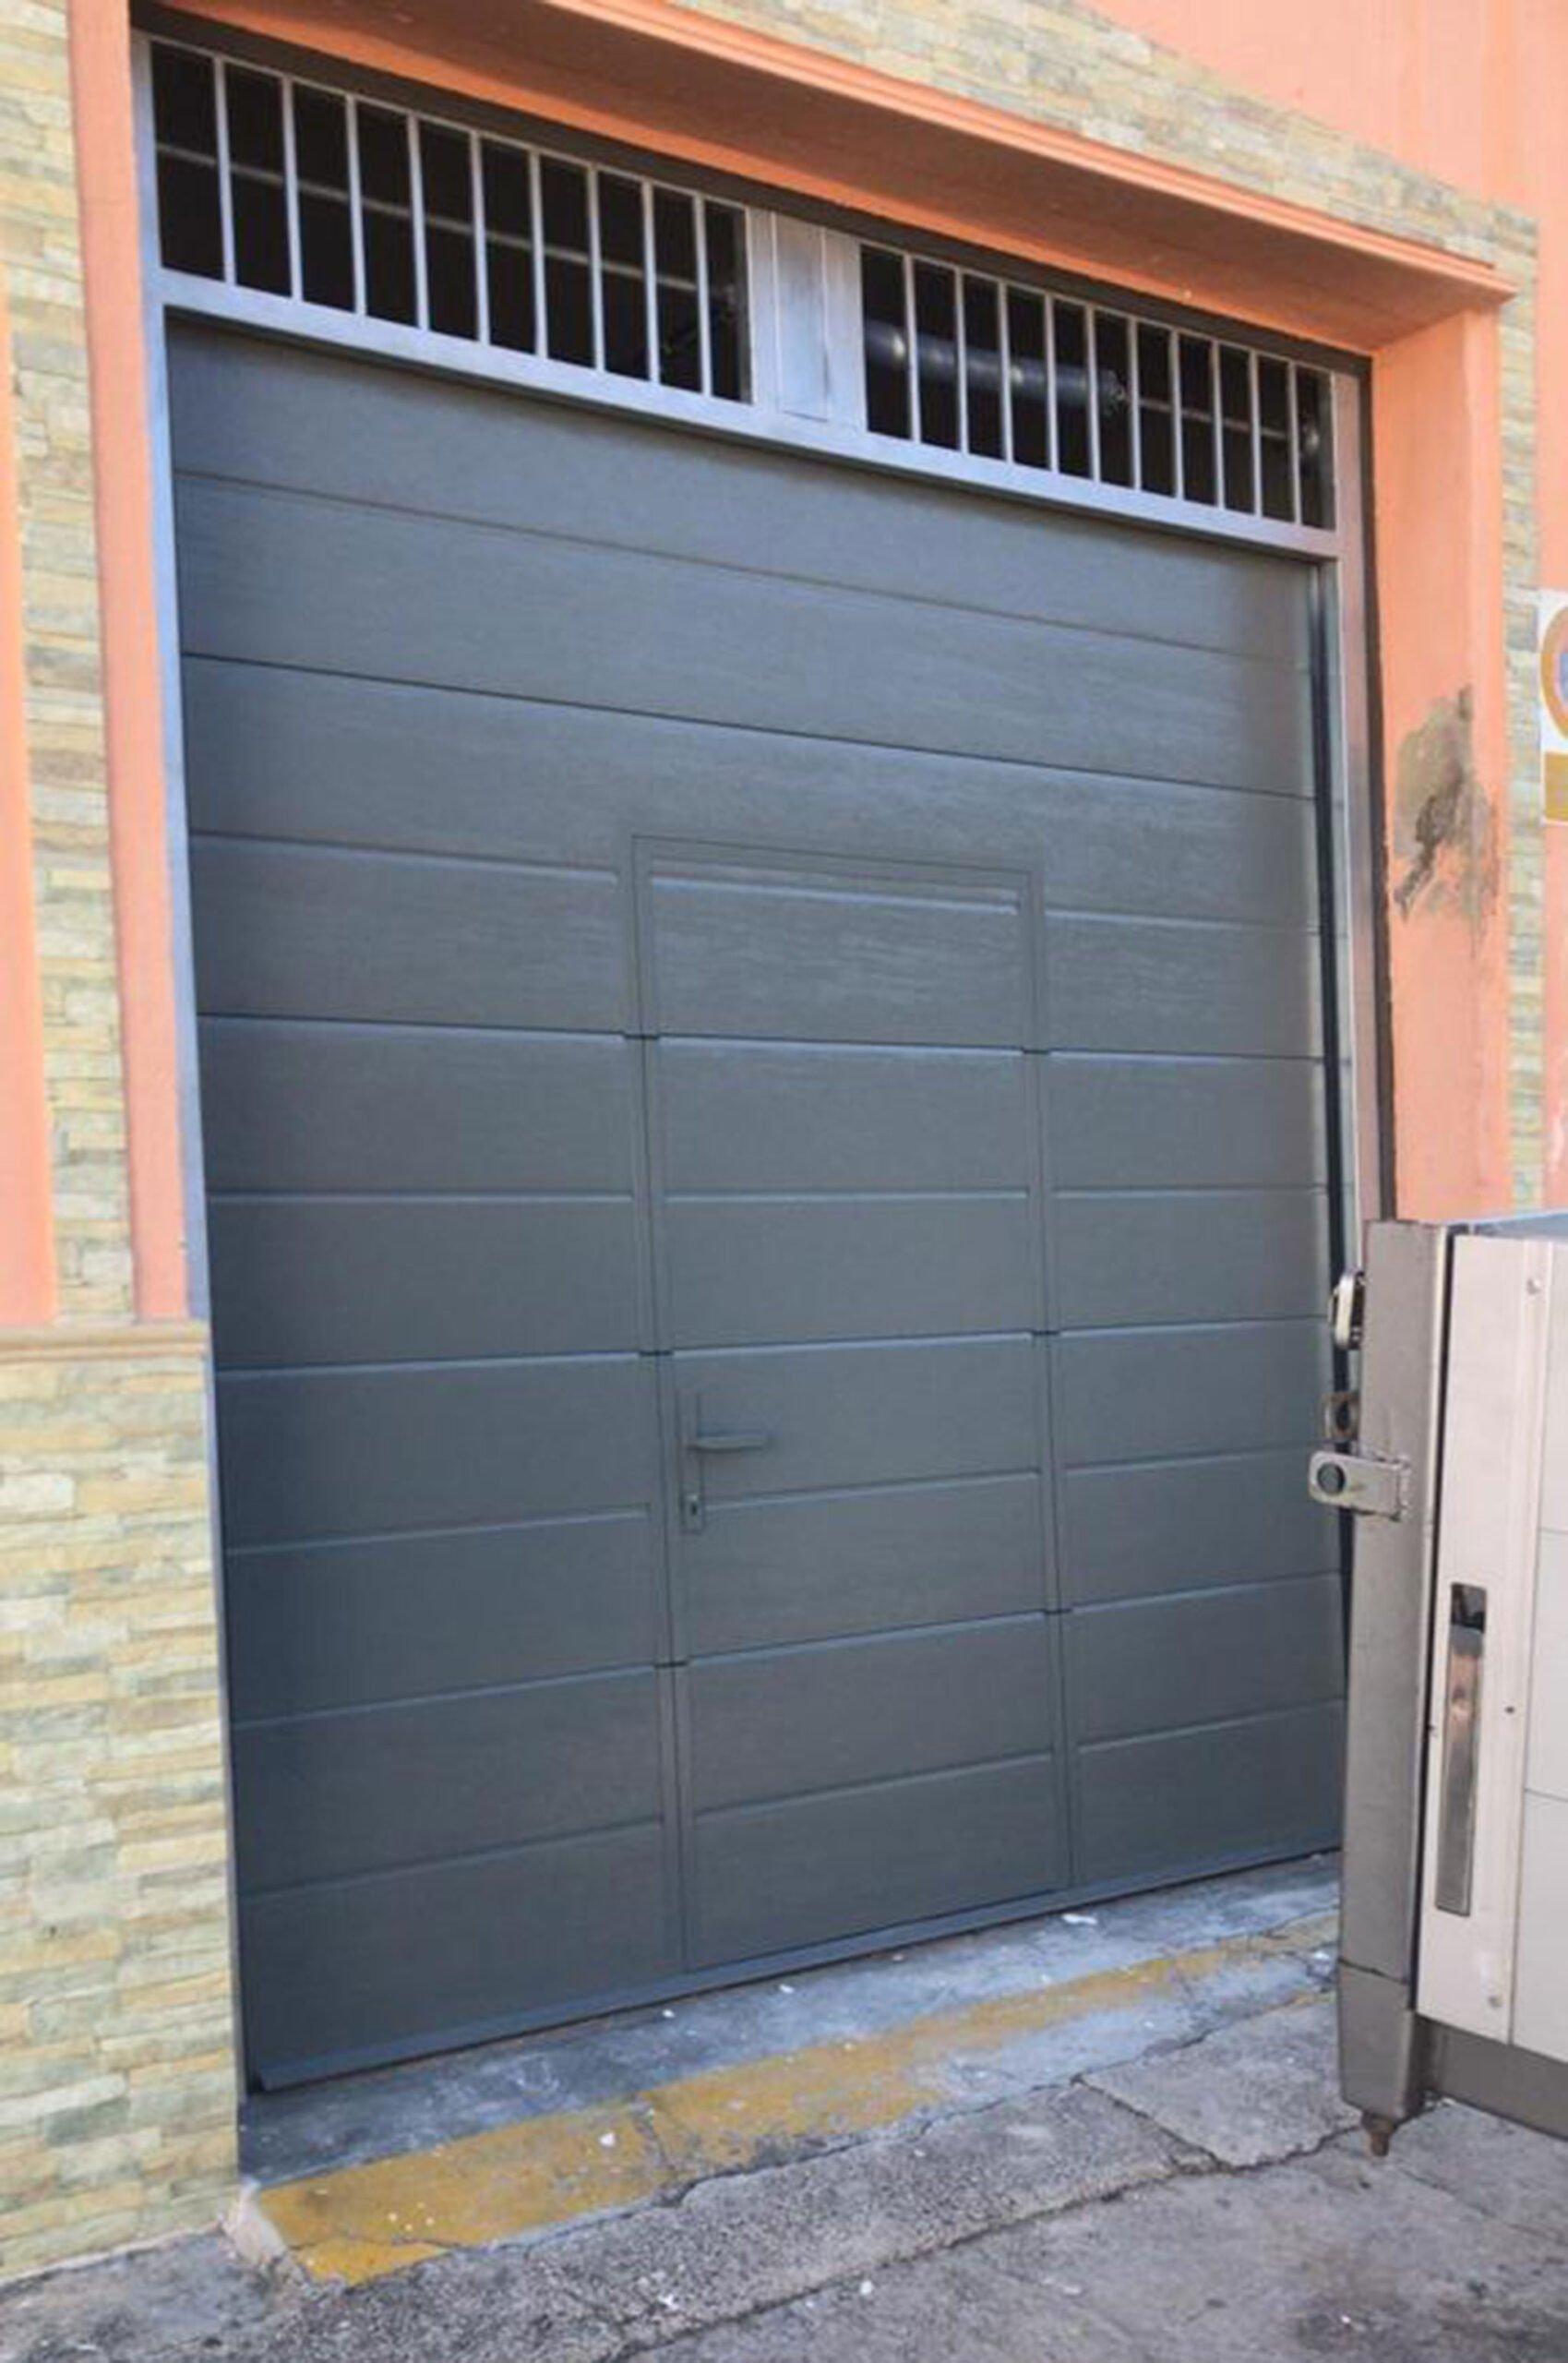 Puerta seccional para garaje en Dénia – Alucardona PVC y Aluminios S.L.